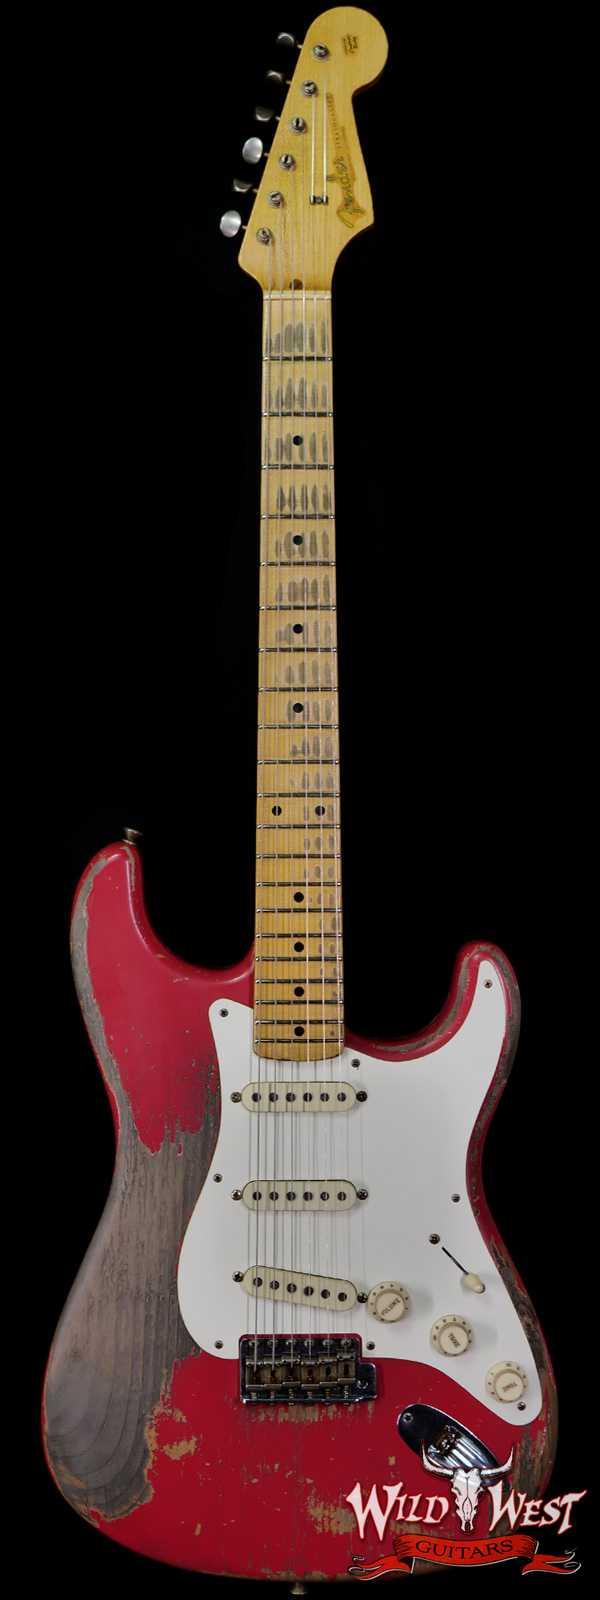 Fender Custom Shop Greg Fessler Masterbuilt 1959 Stratocaster Heavy Relic Josefina Hand-wound Pickups Fiesta Red